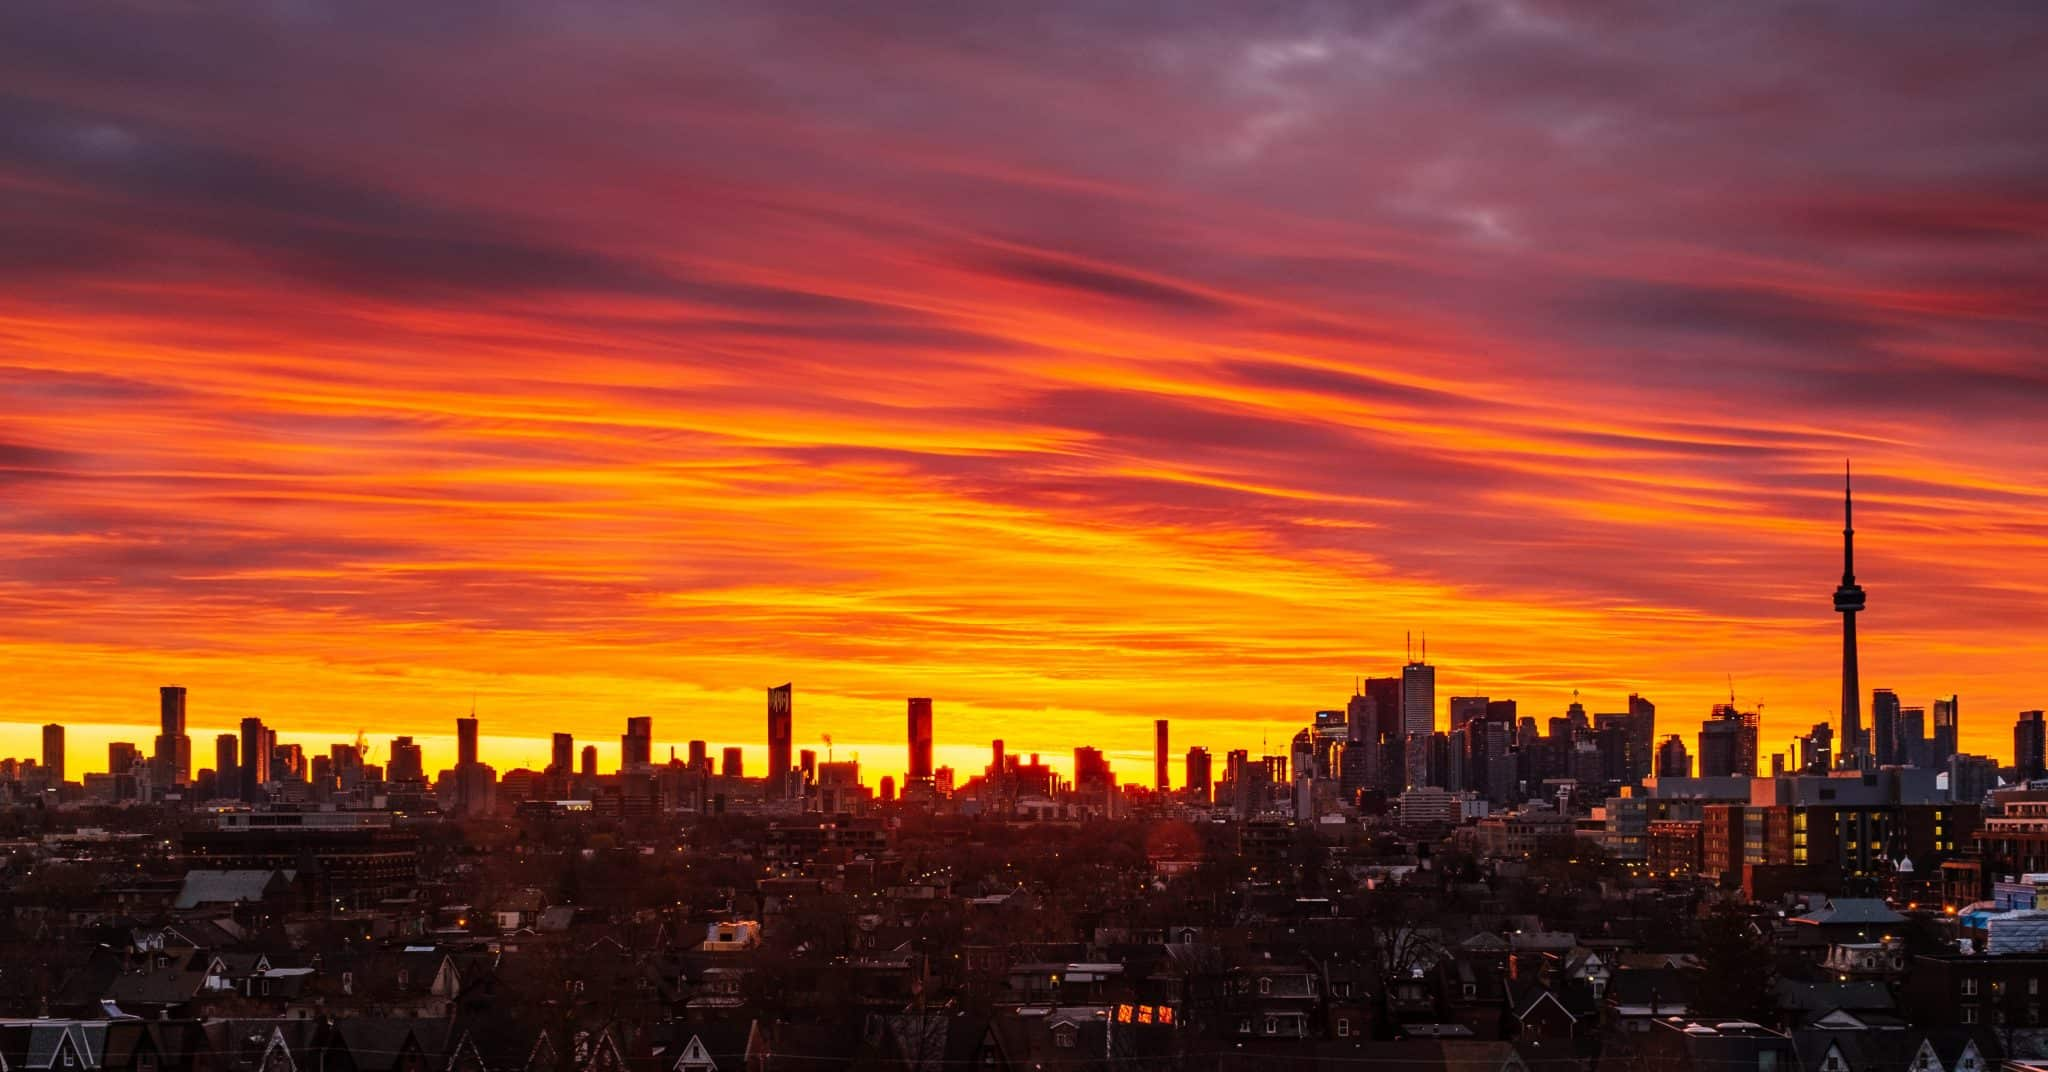 Fiery sky over Toronto